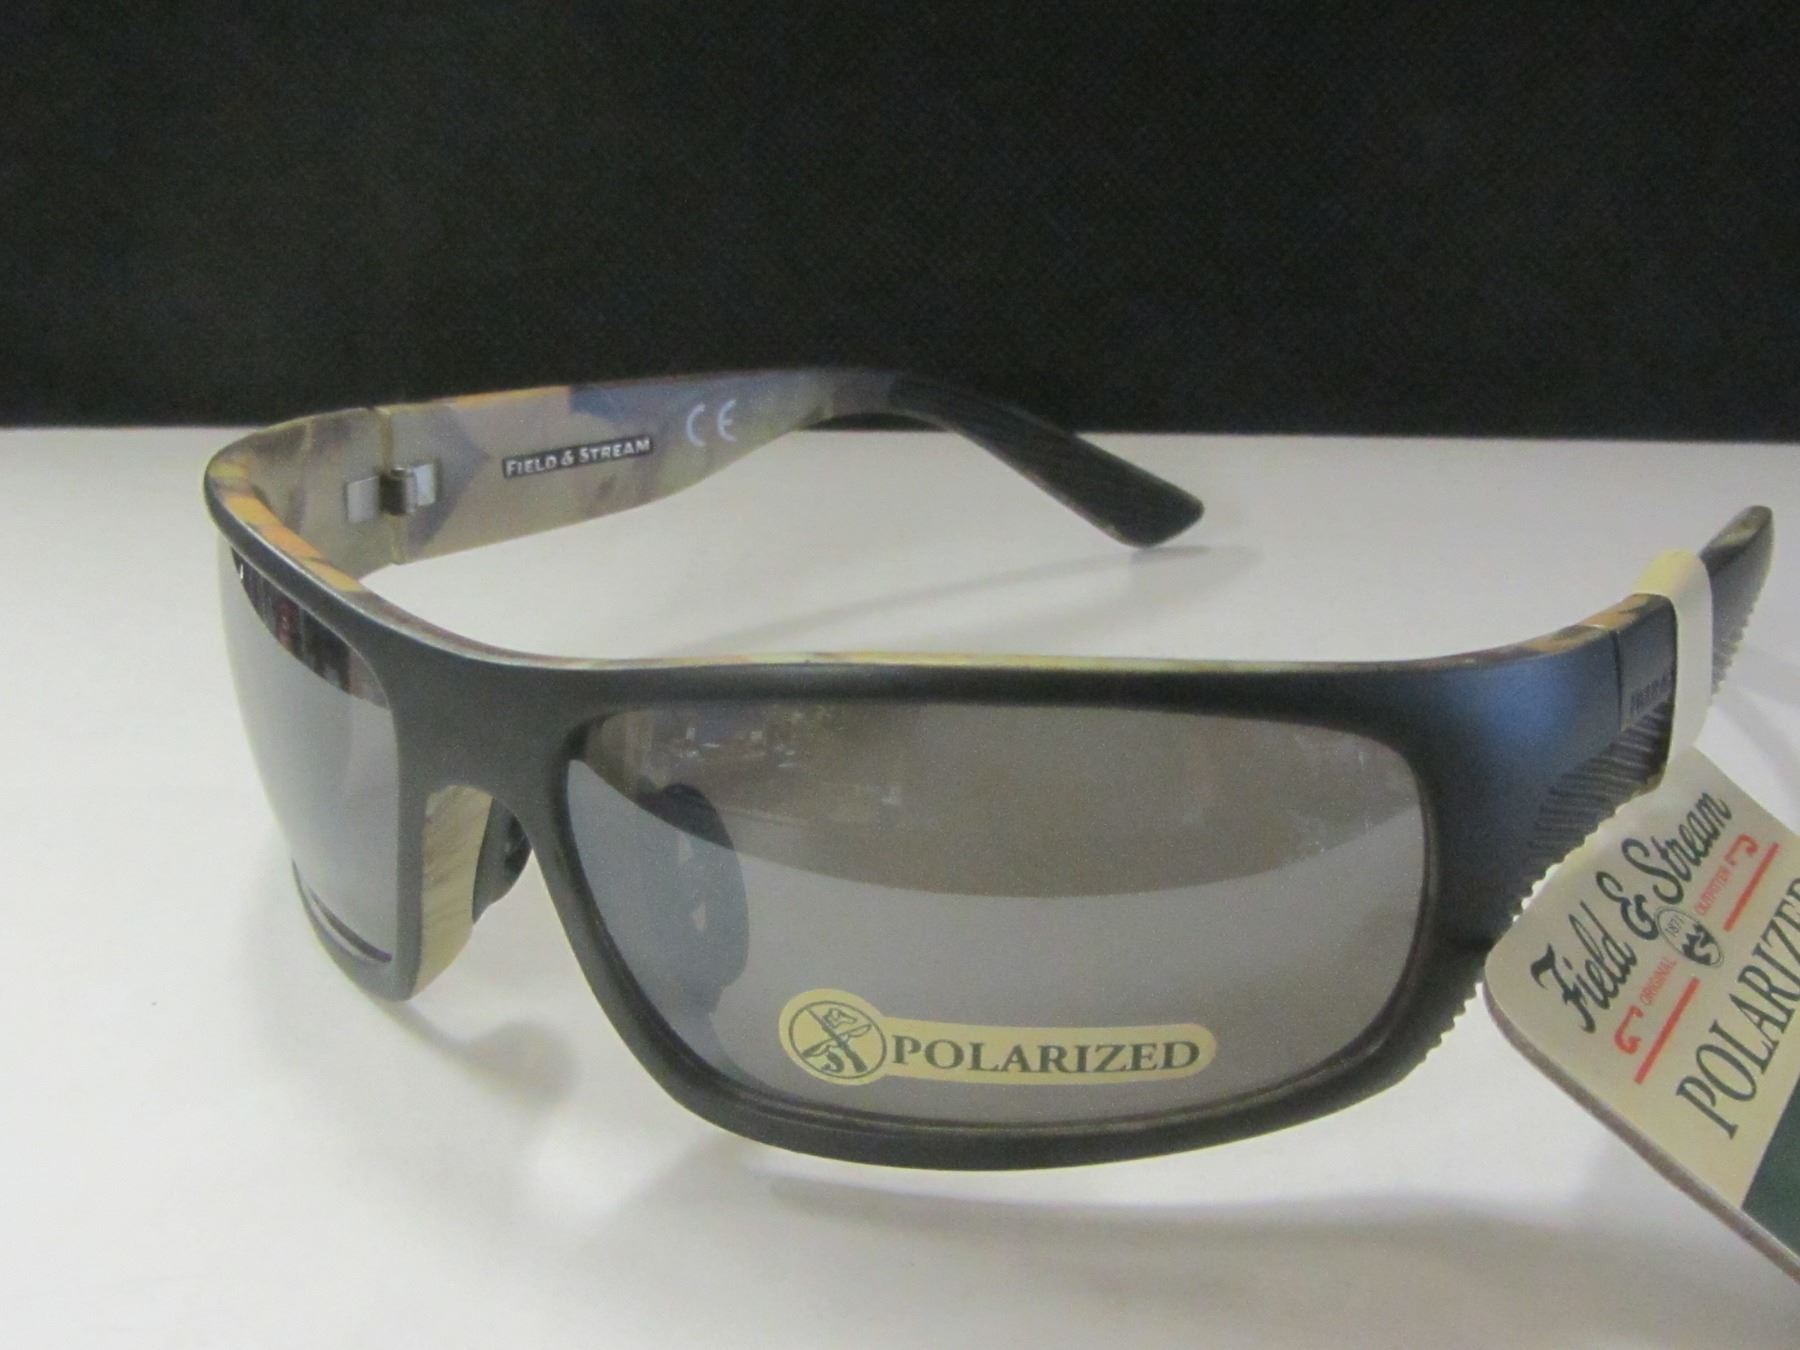 9885538ab7 Image 1   New Field   Stream Polarized Sunglasses   39.99 tags